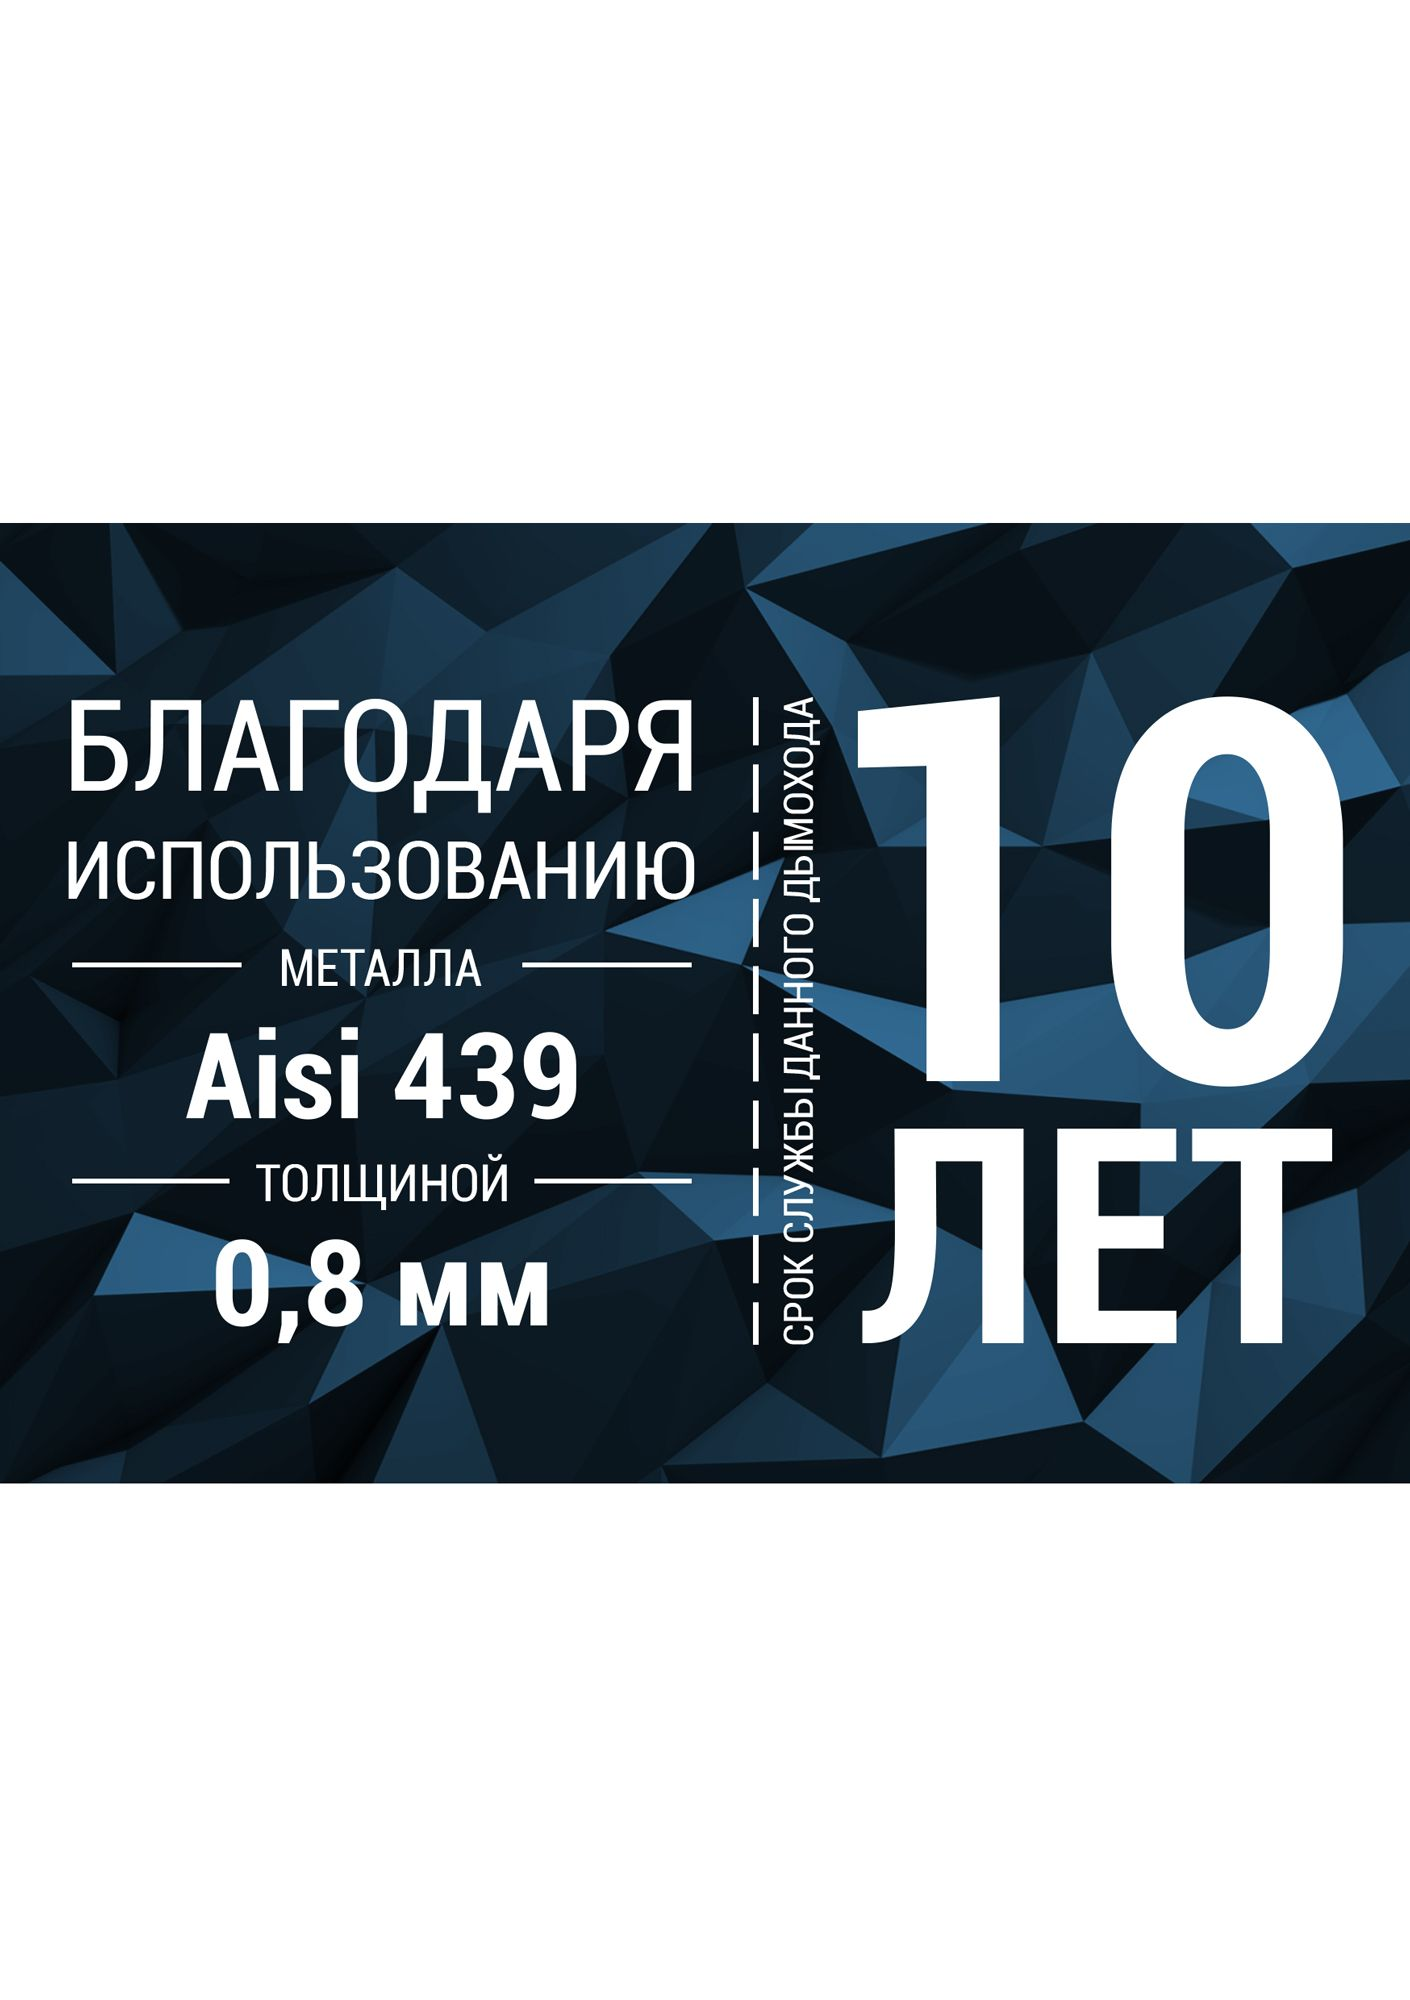 Наклейка на дымоход - дизайнер goljakovai